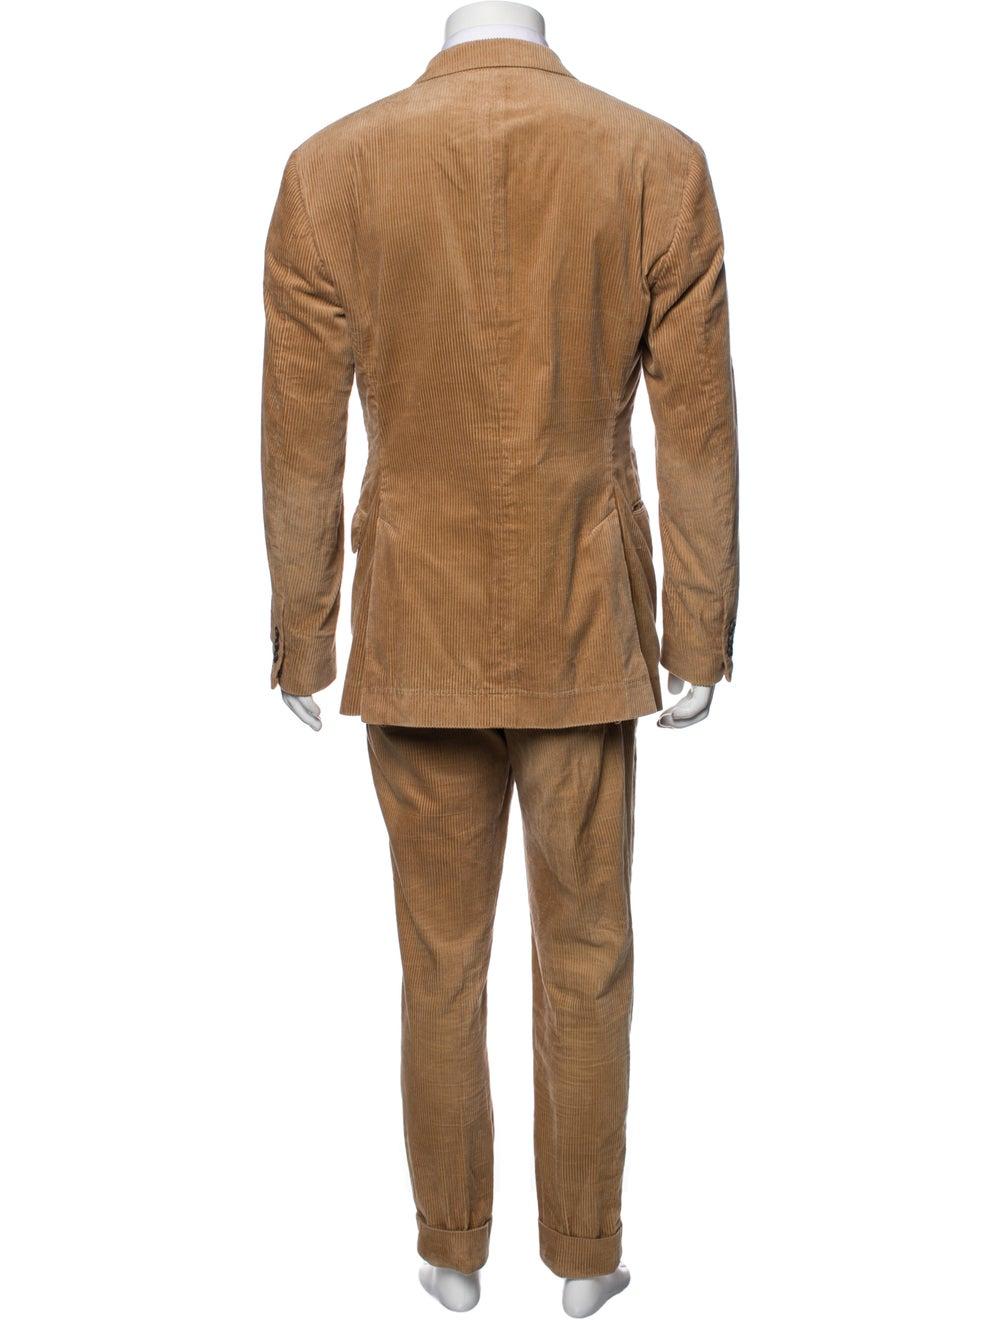 Brunello Cucinelli Two-Piece Suit - image 3